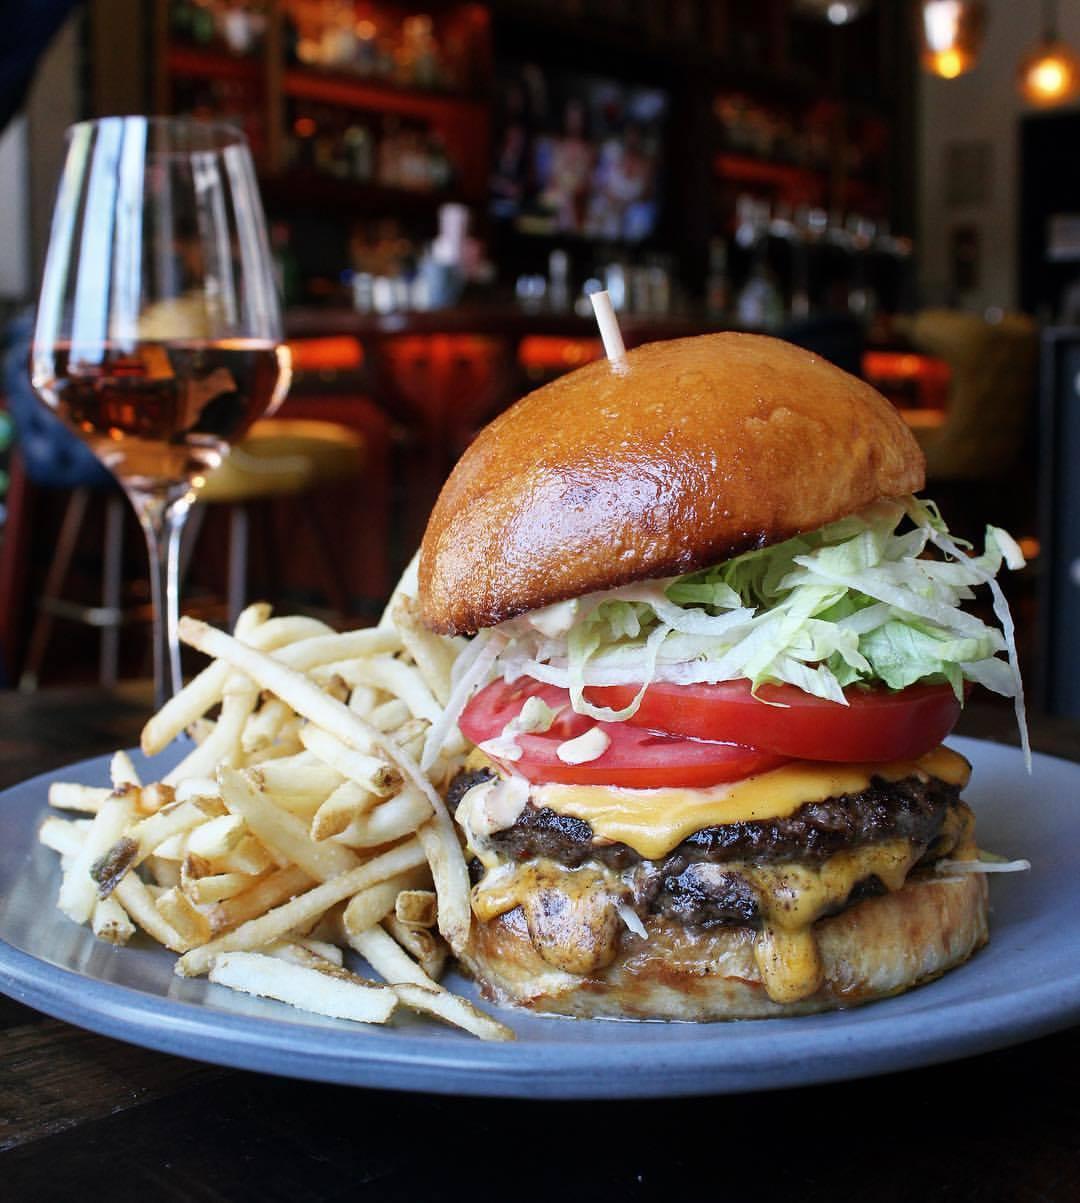 Finn Town's burger